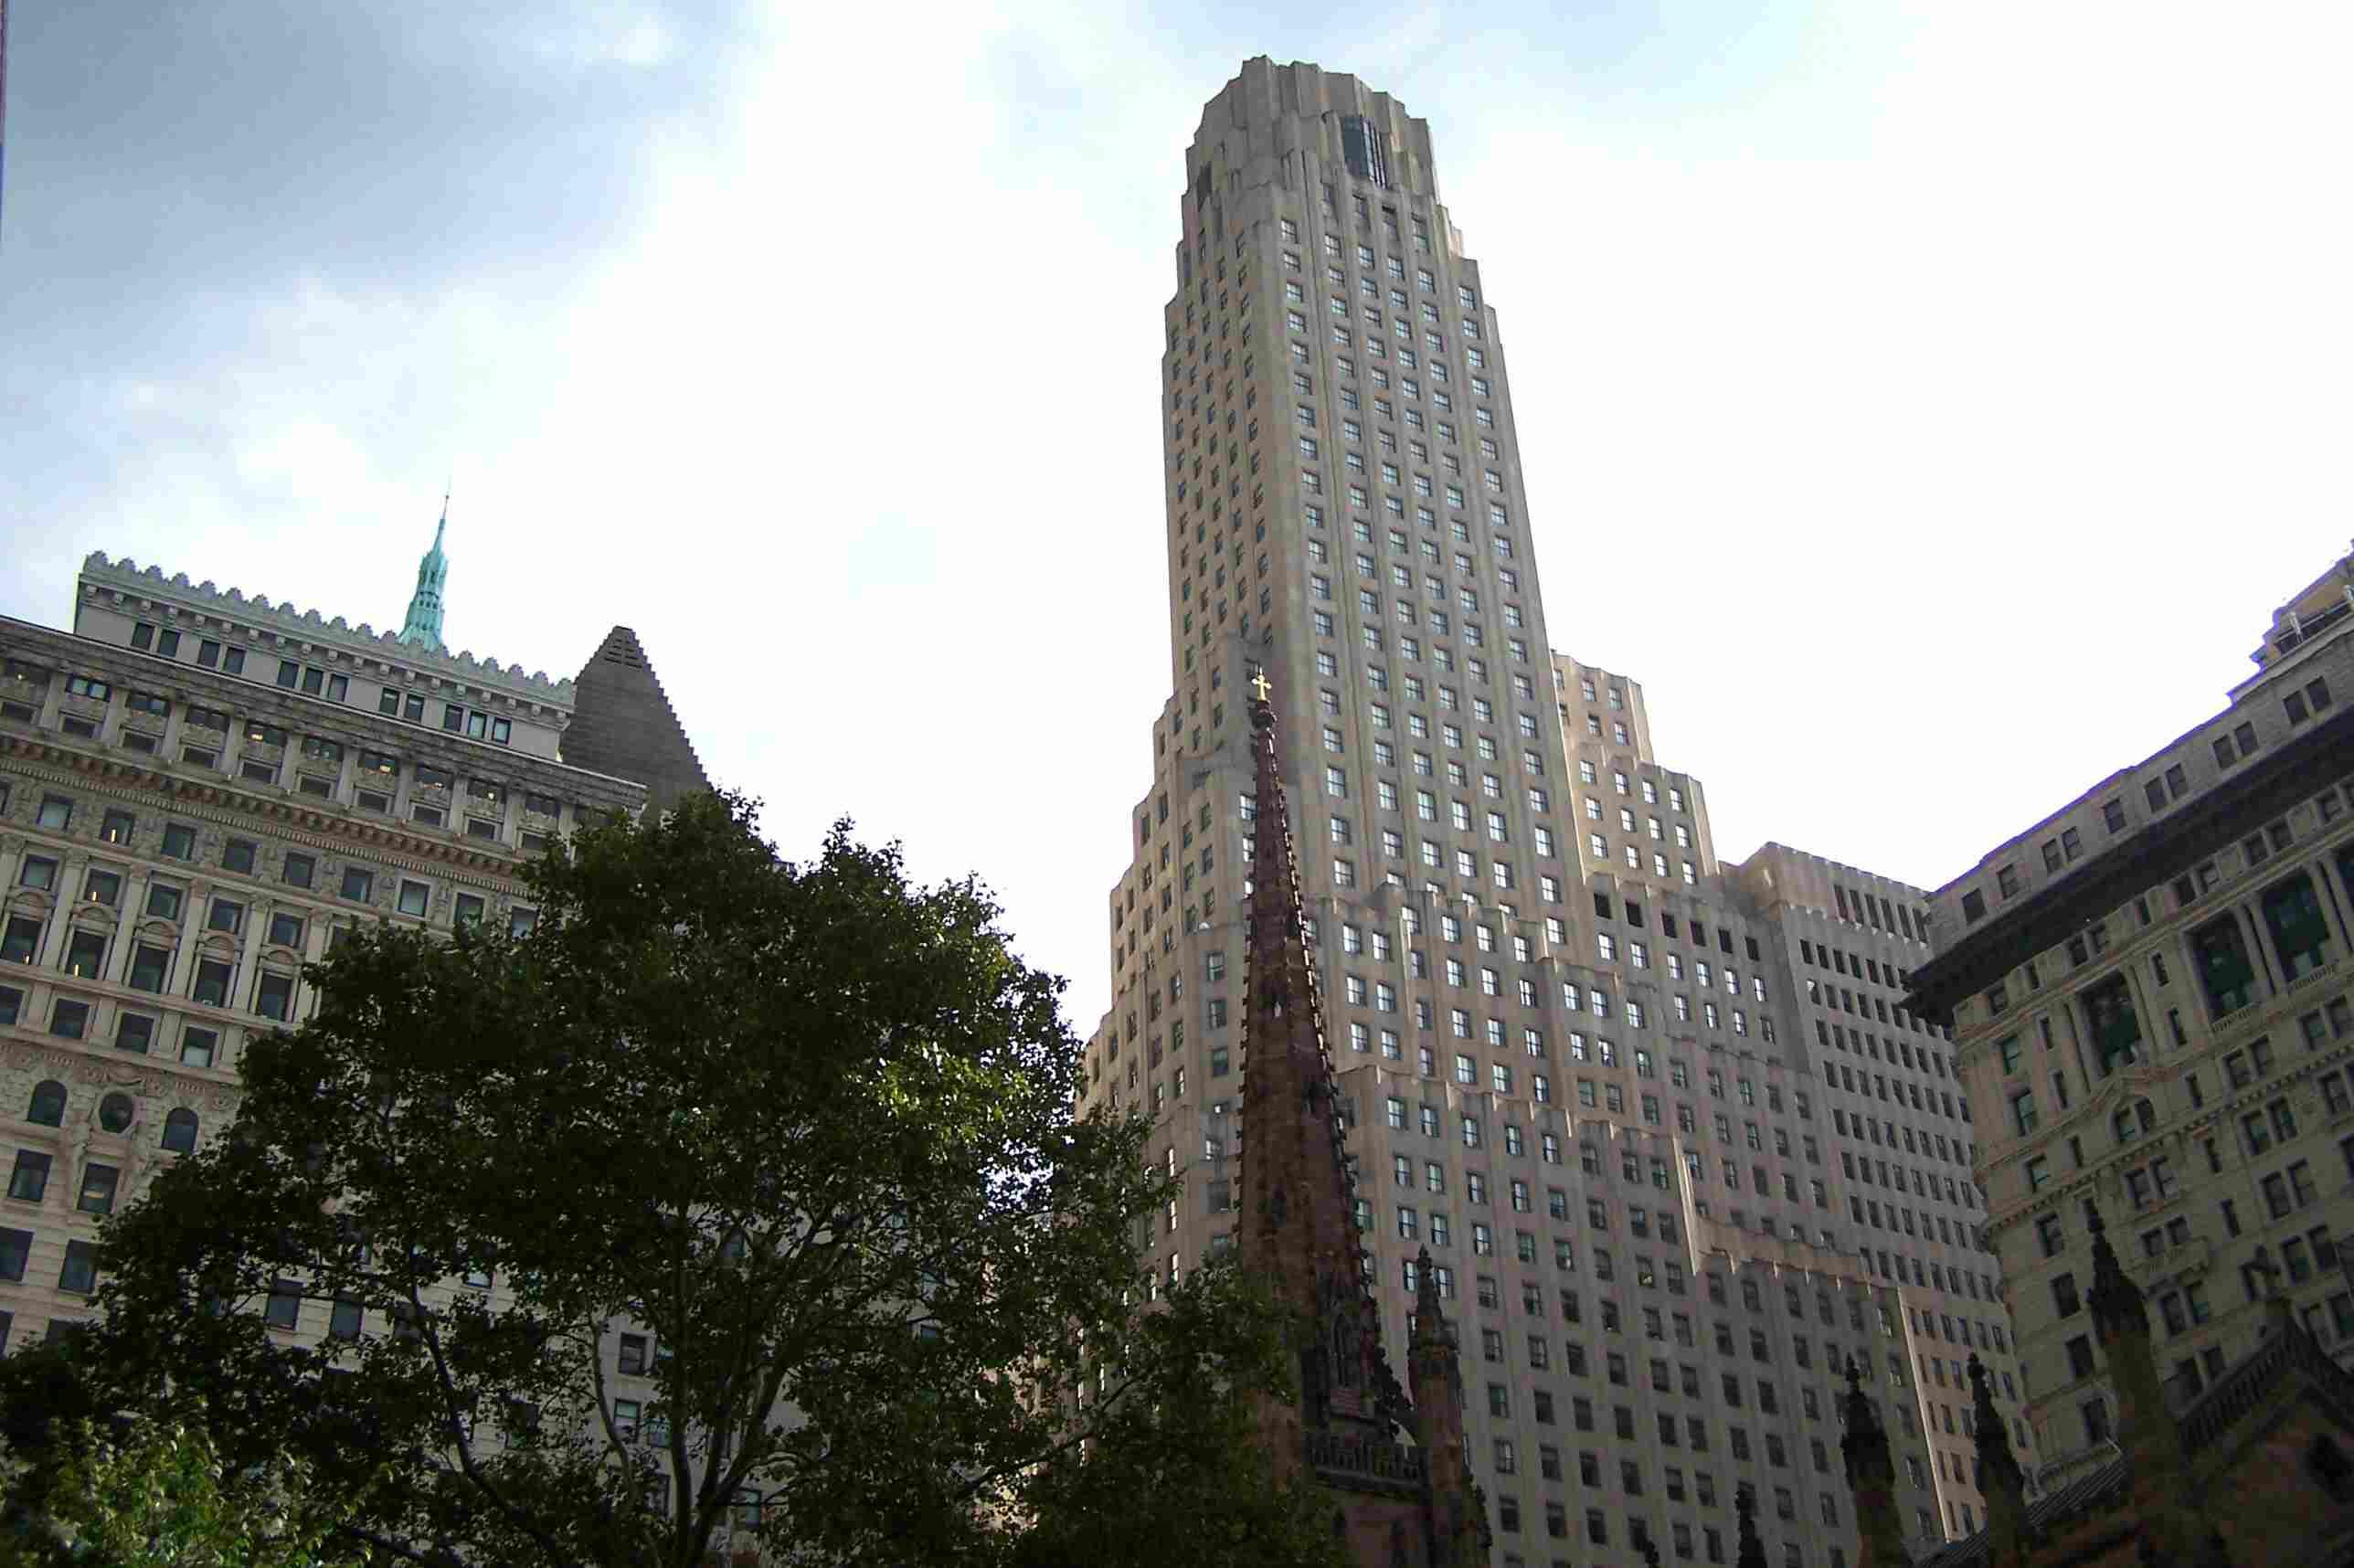 Steplike setbacks on One Wall Street as seen from behind Trinity Church.